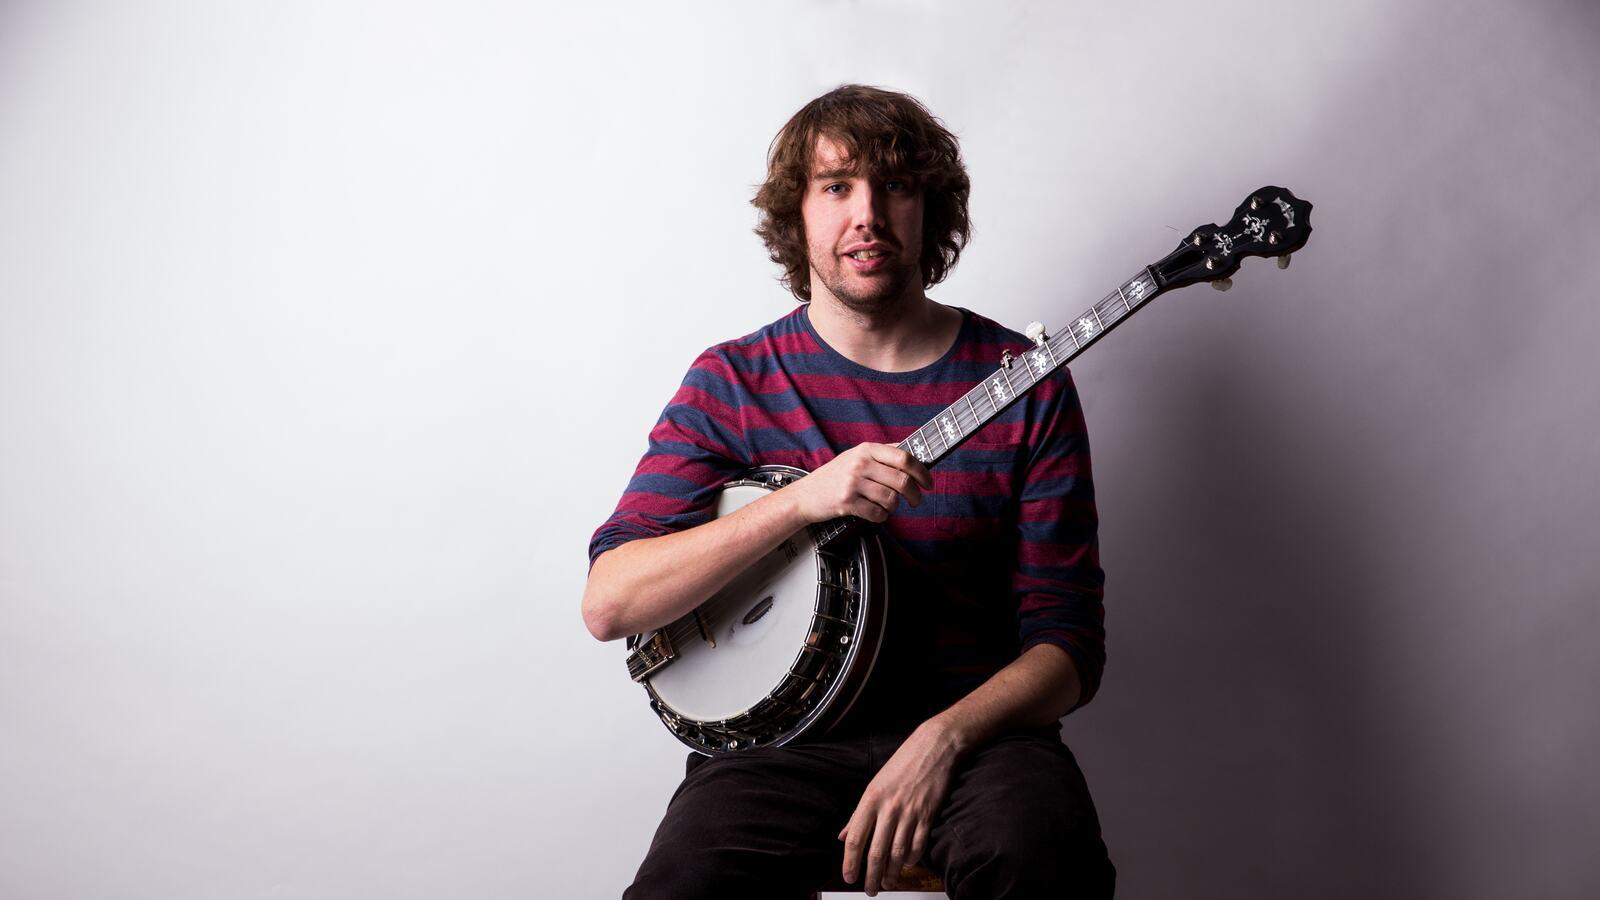 Friday Lunch: Dan Walsh, banjoist and guitarist